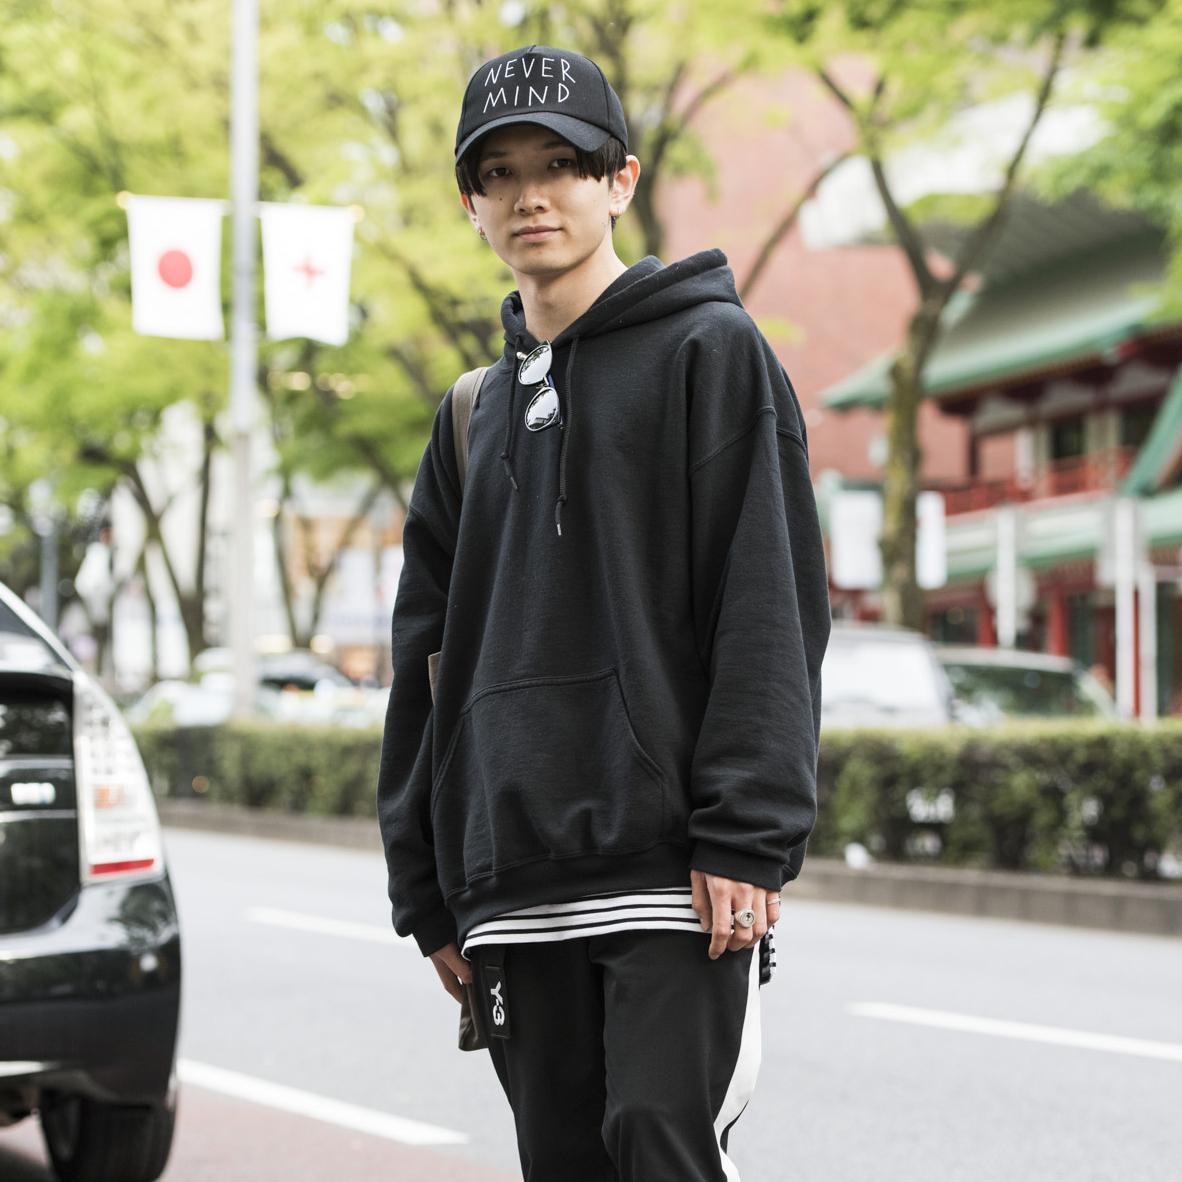 【SNAP JACK】ストリートの帝王現る! 鈴木樹くん・大学生